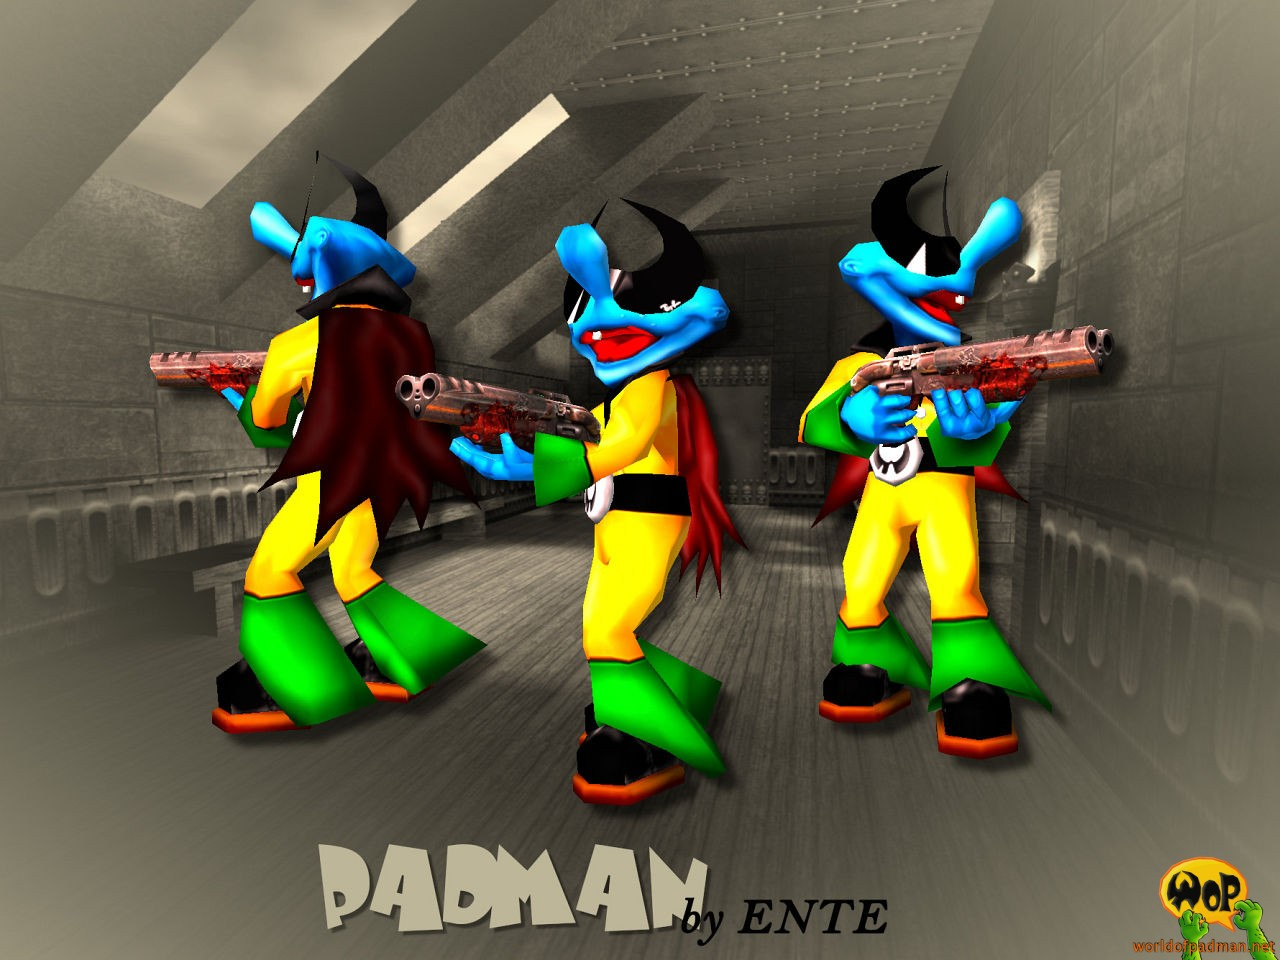 ENTE's Padman for Quake 3 Arena